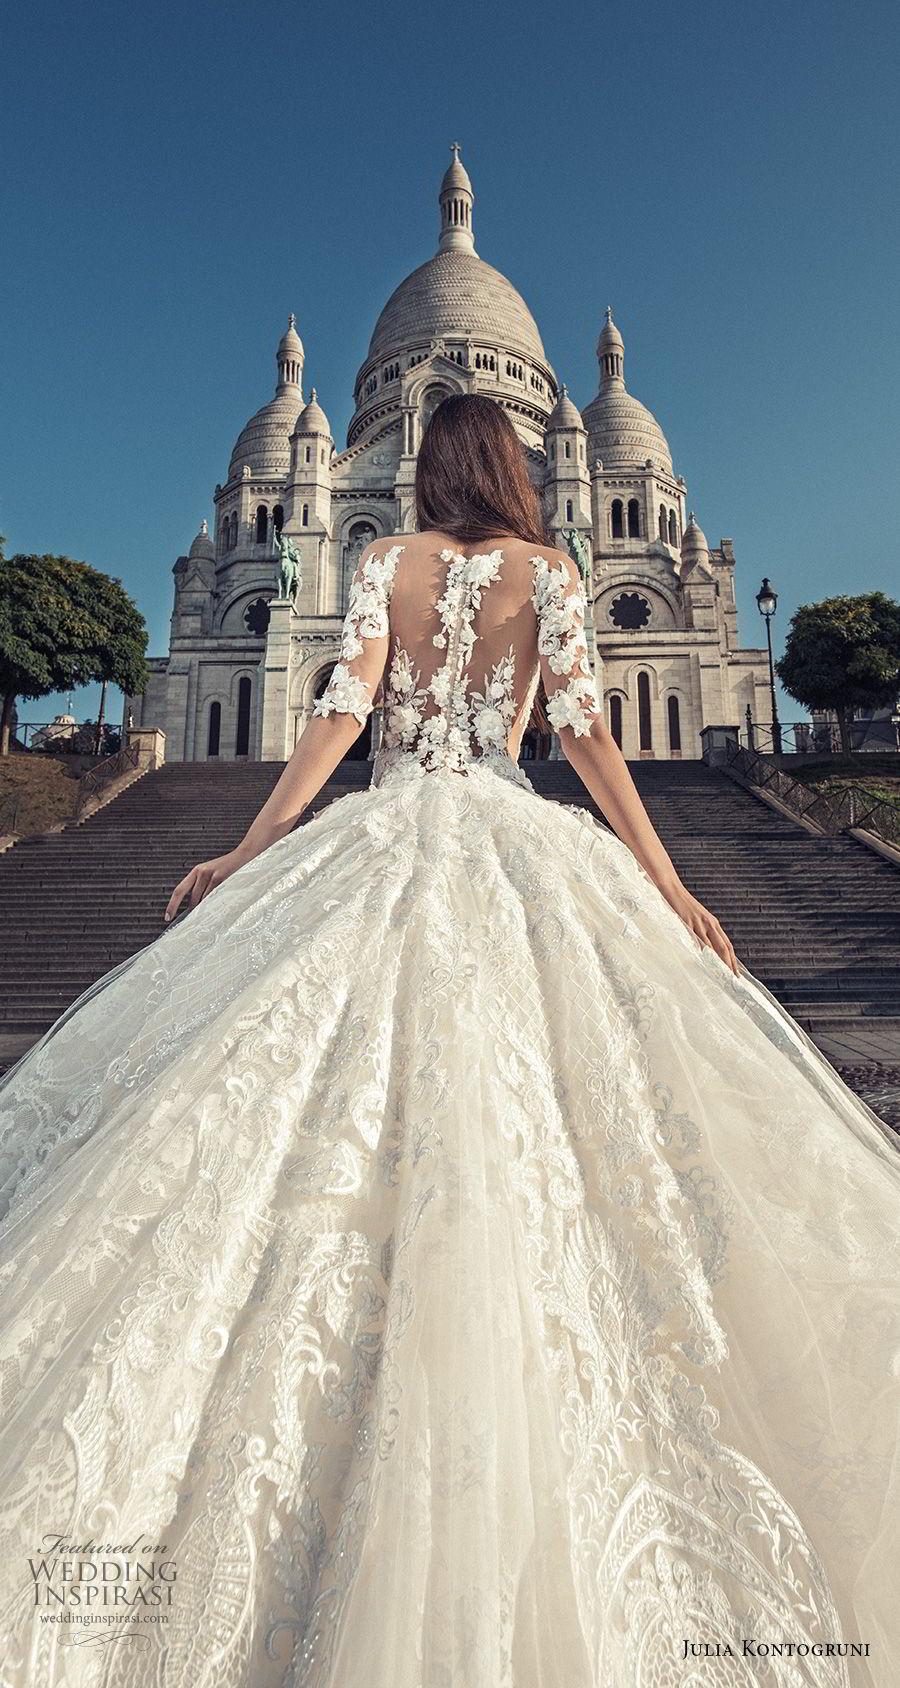 julia kontogruni 2018 bridal half sleeves off shoulder sweetheart neckline full embellishment princess ball gown wedding dress sheer lace back royal train (1) zbv